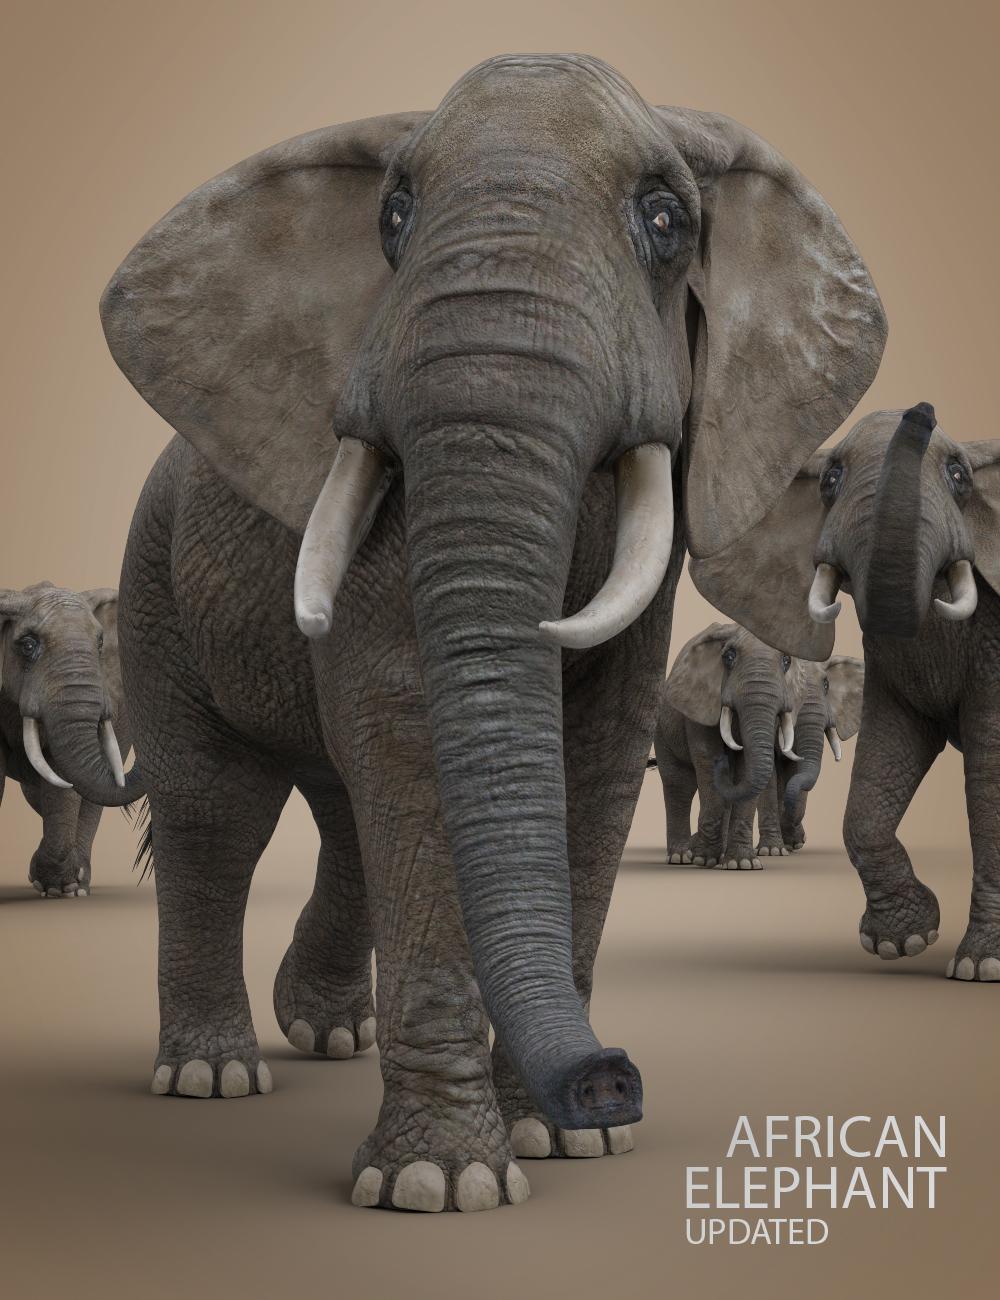 African Elephant Updated by: Deepsea, 3D Models by Daz 3D